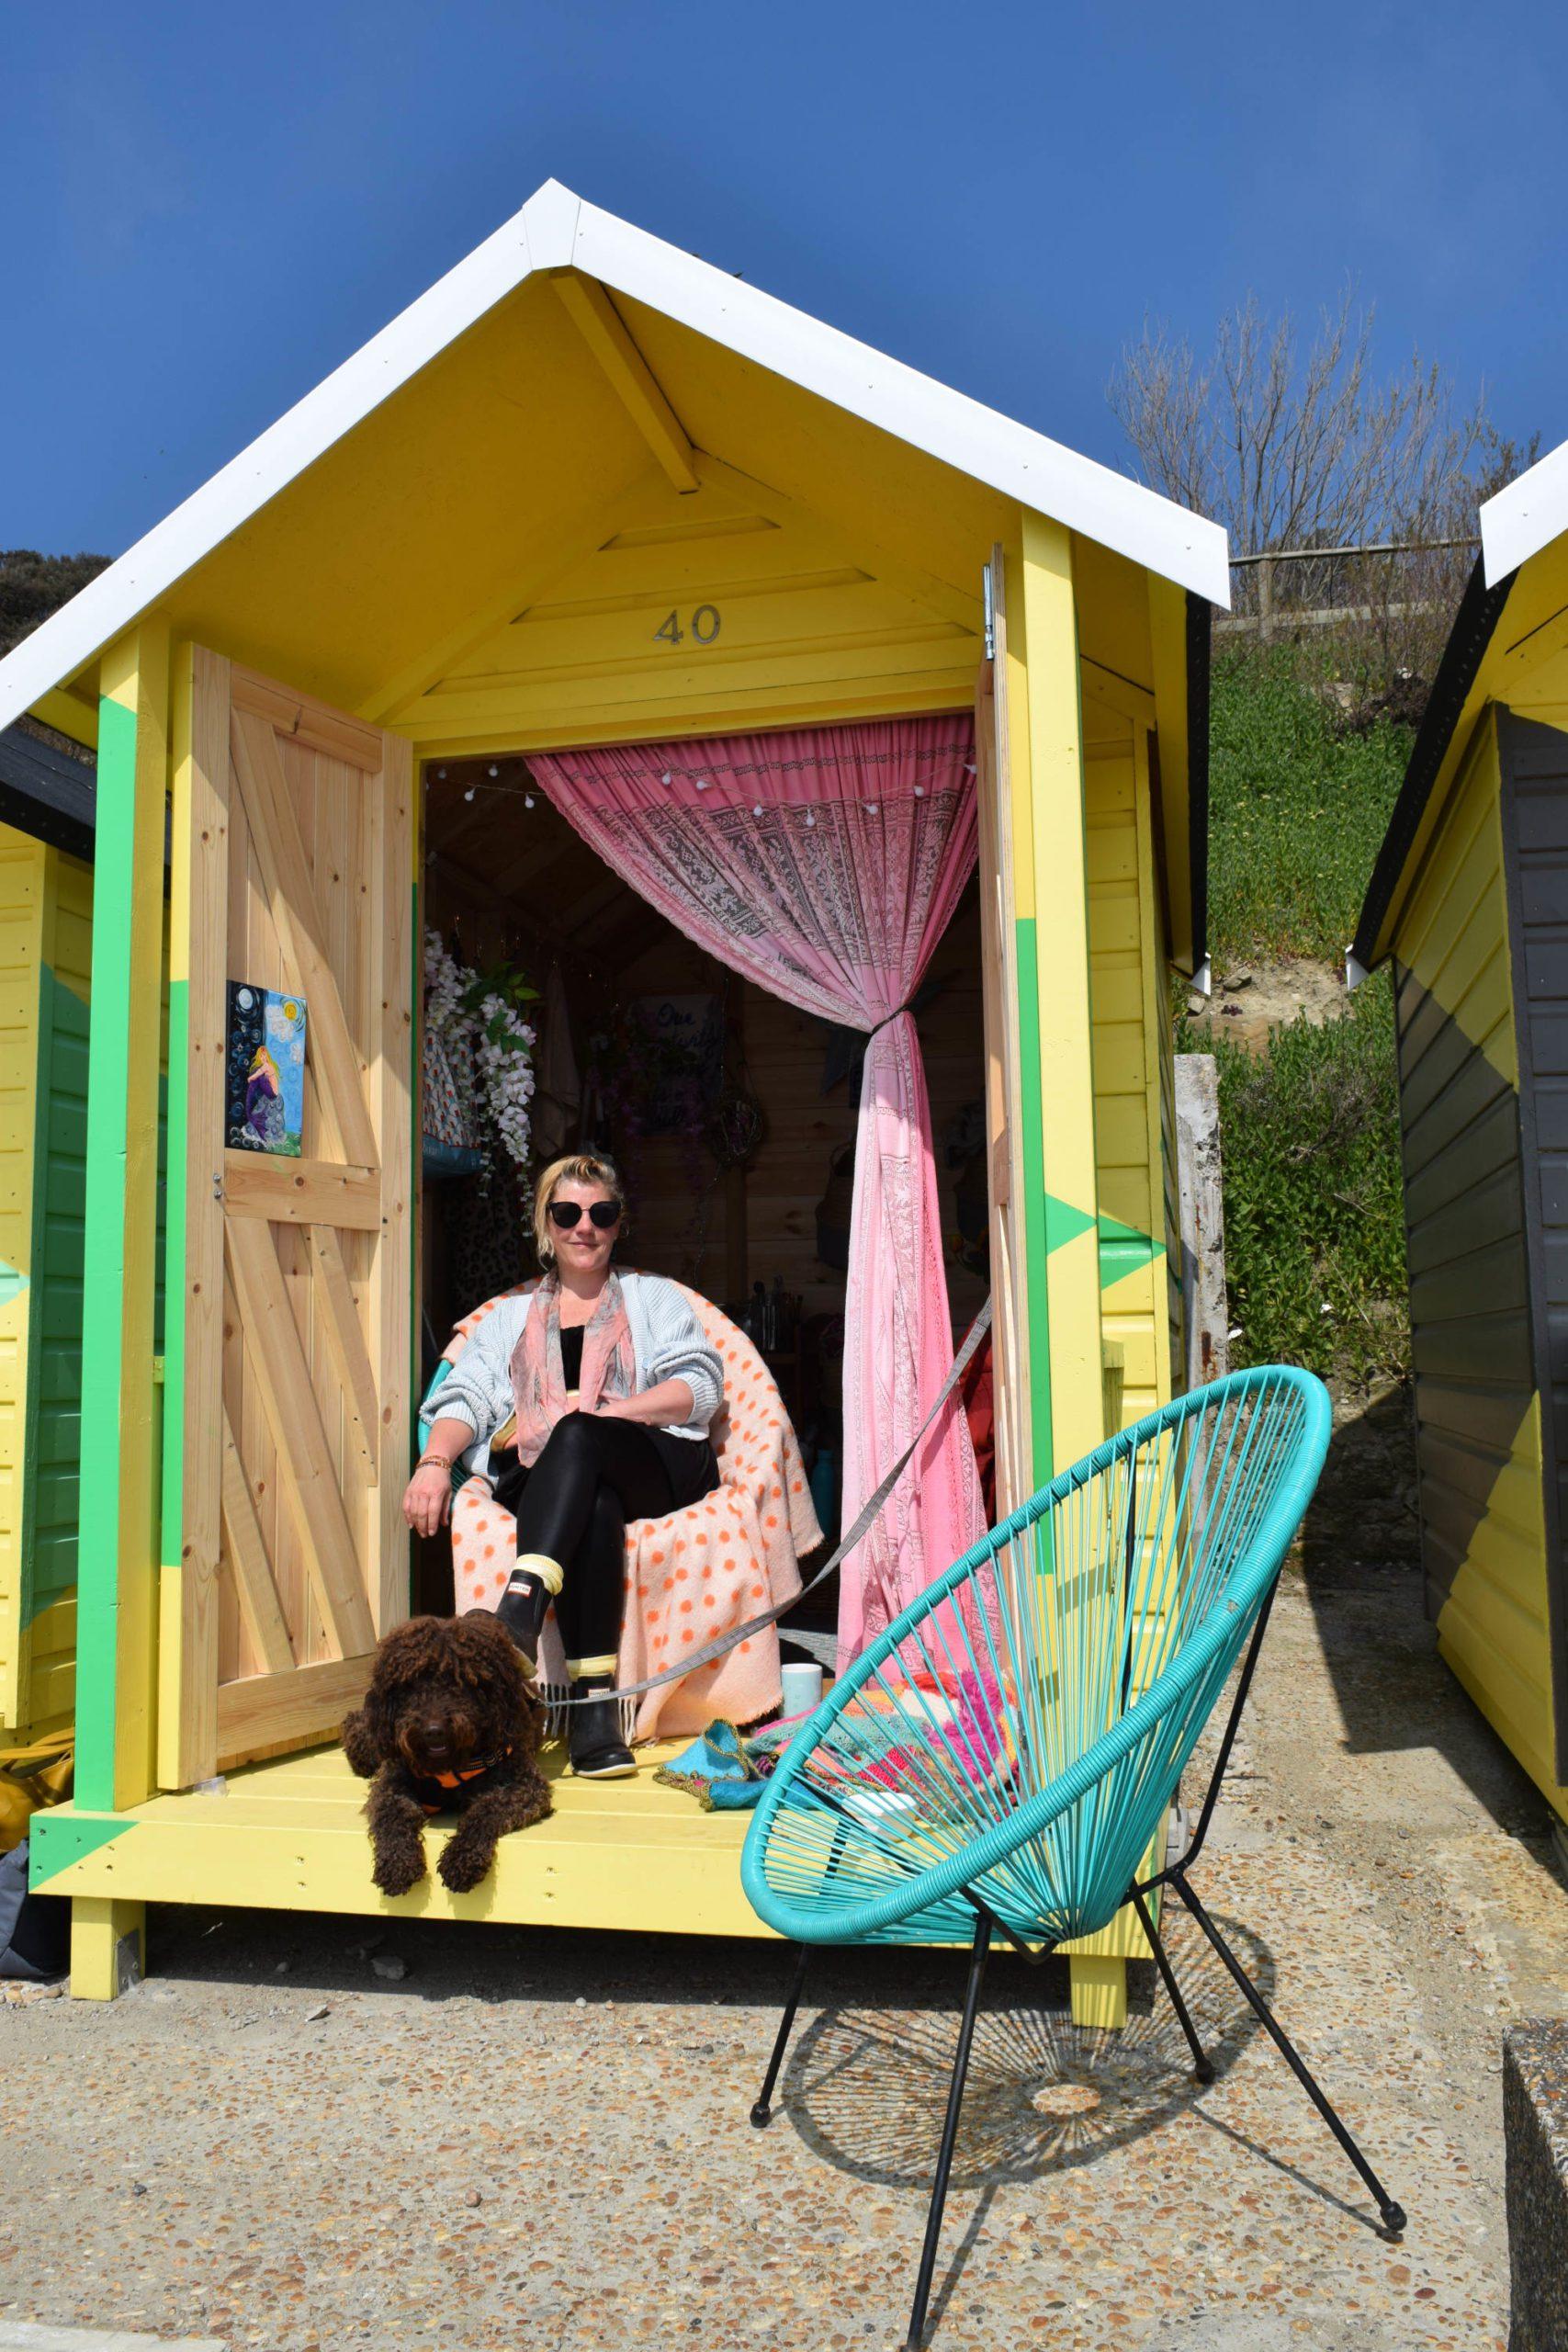 Di Burns and Beau at the Beach Hut